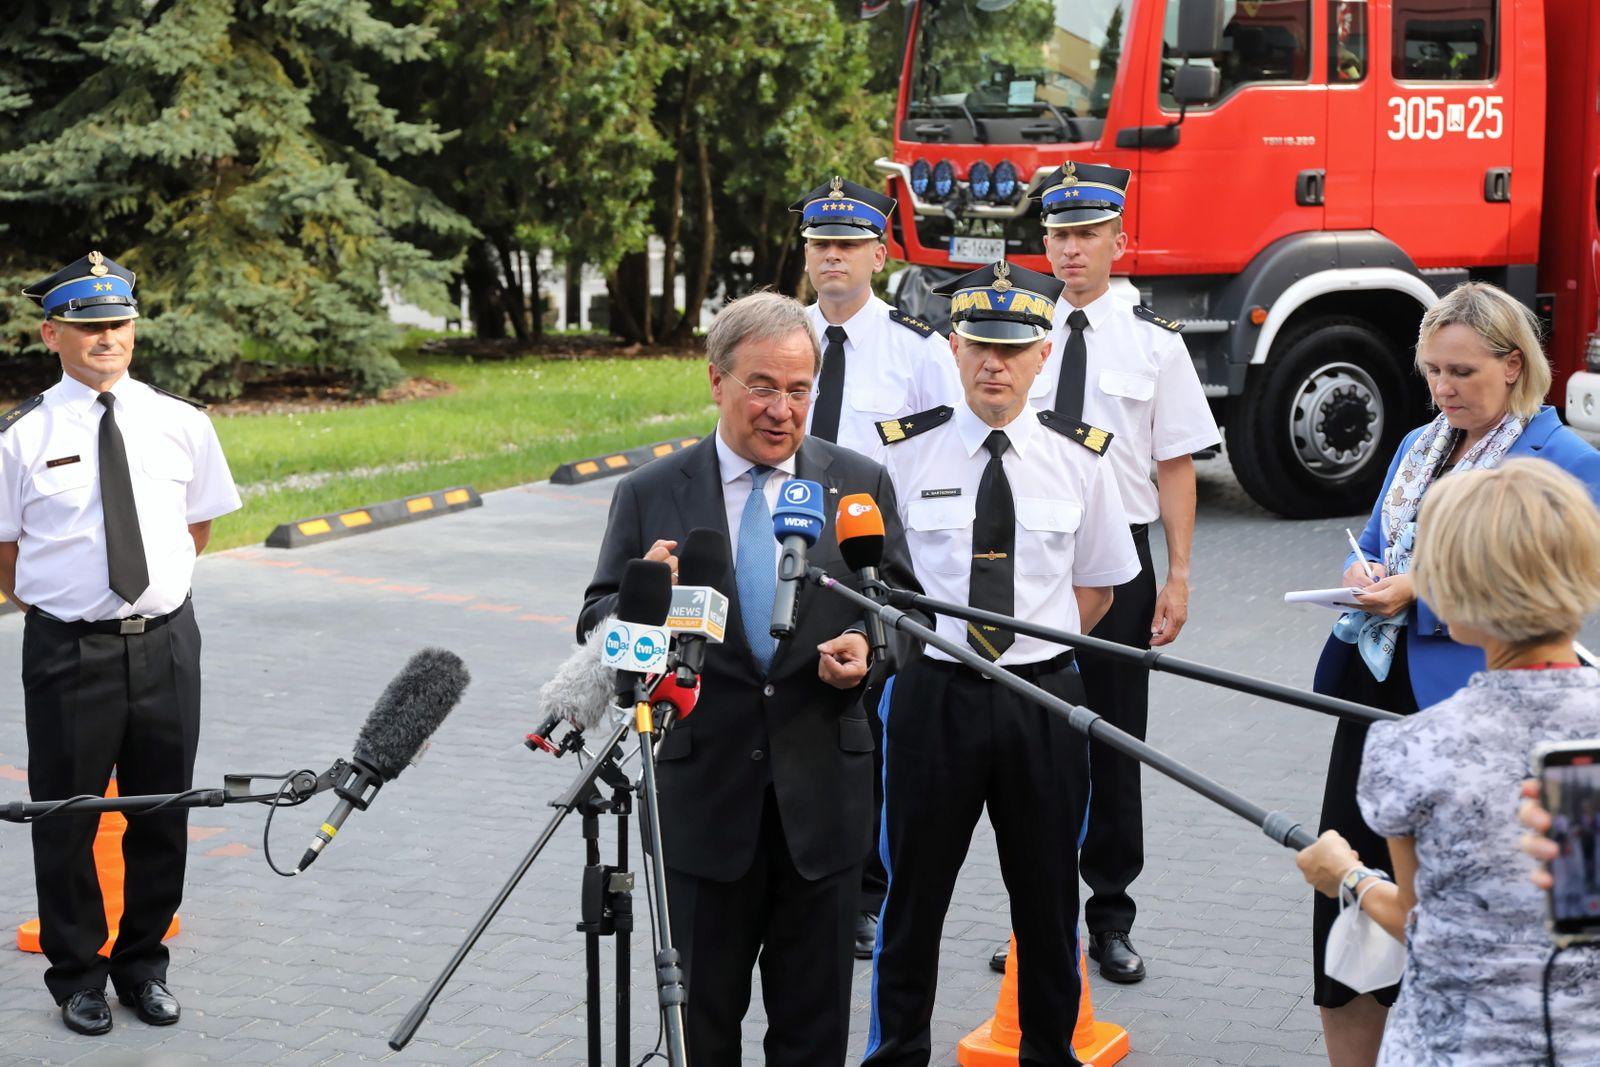 Prime Minister of North Rhine Westphalia Armin Laschet visit